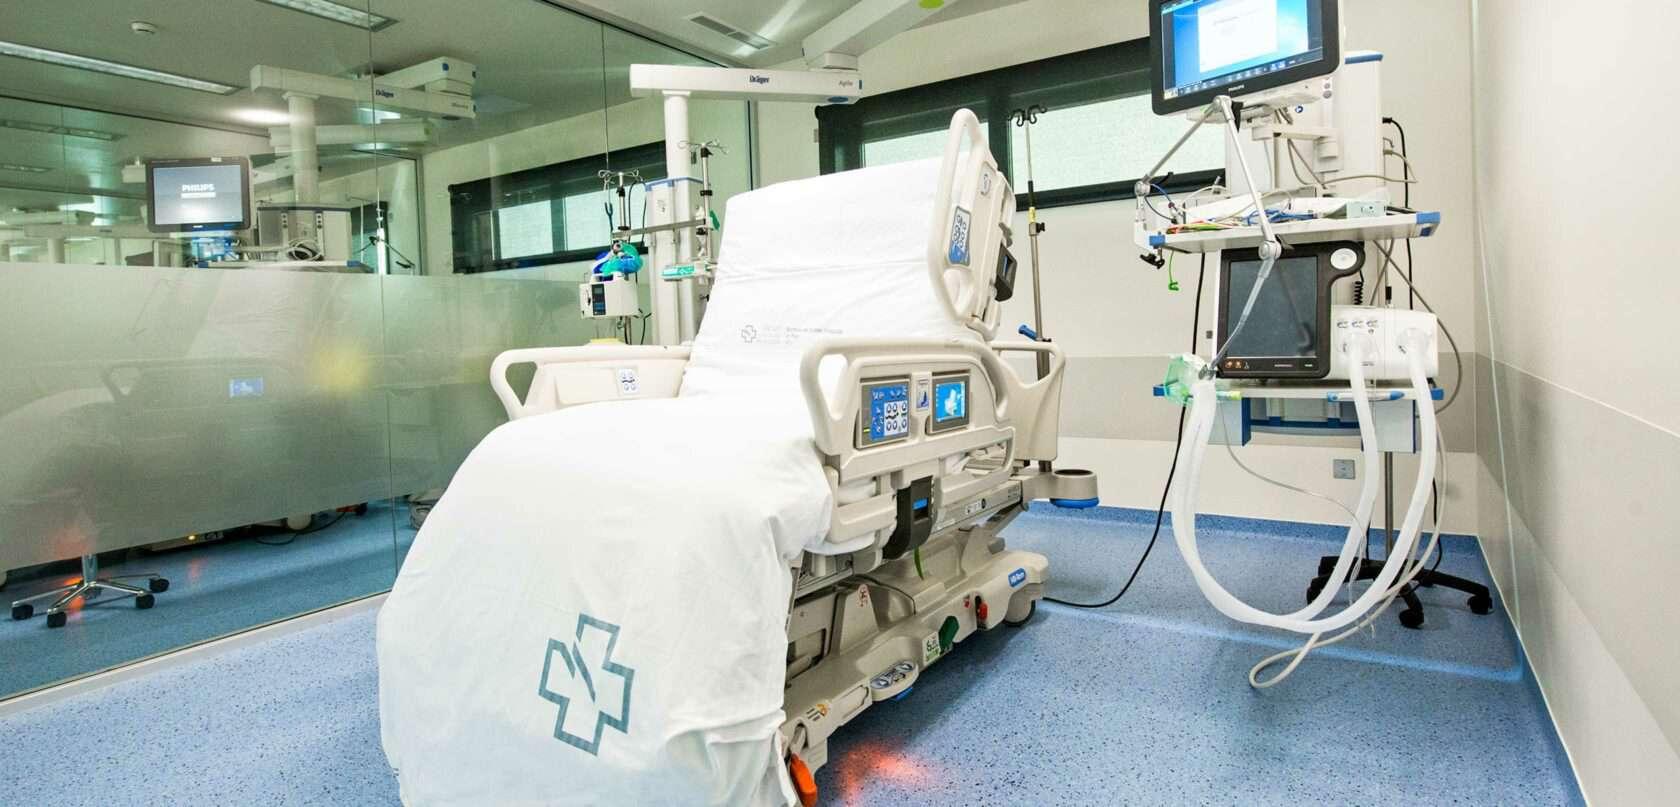 A hospital chair in a room. (Vigo, 2015)